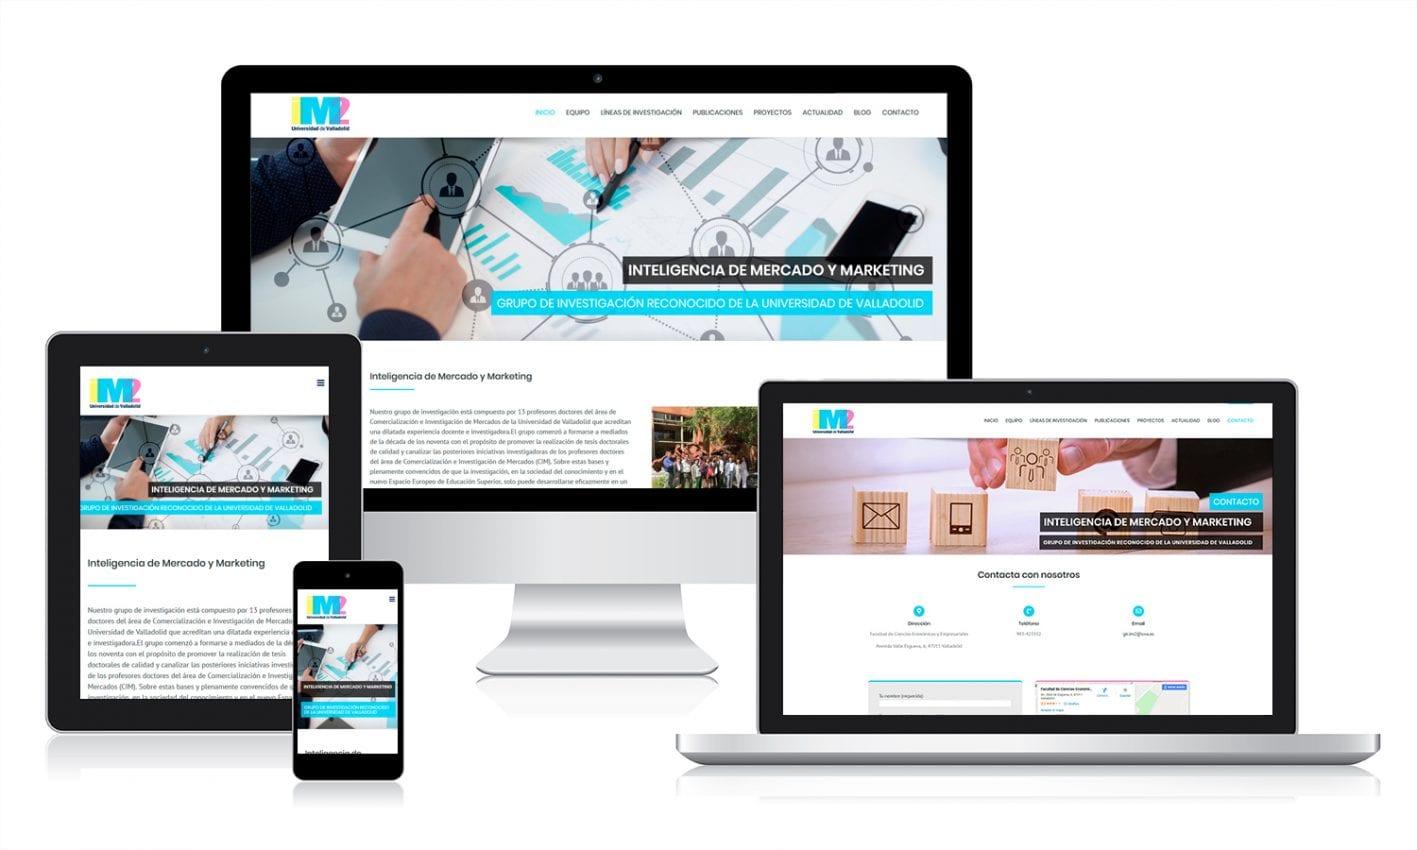 Desarrollo web en WordPress para GIR de la UVA